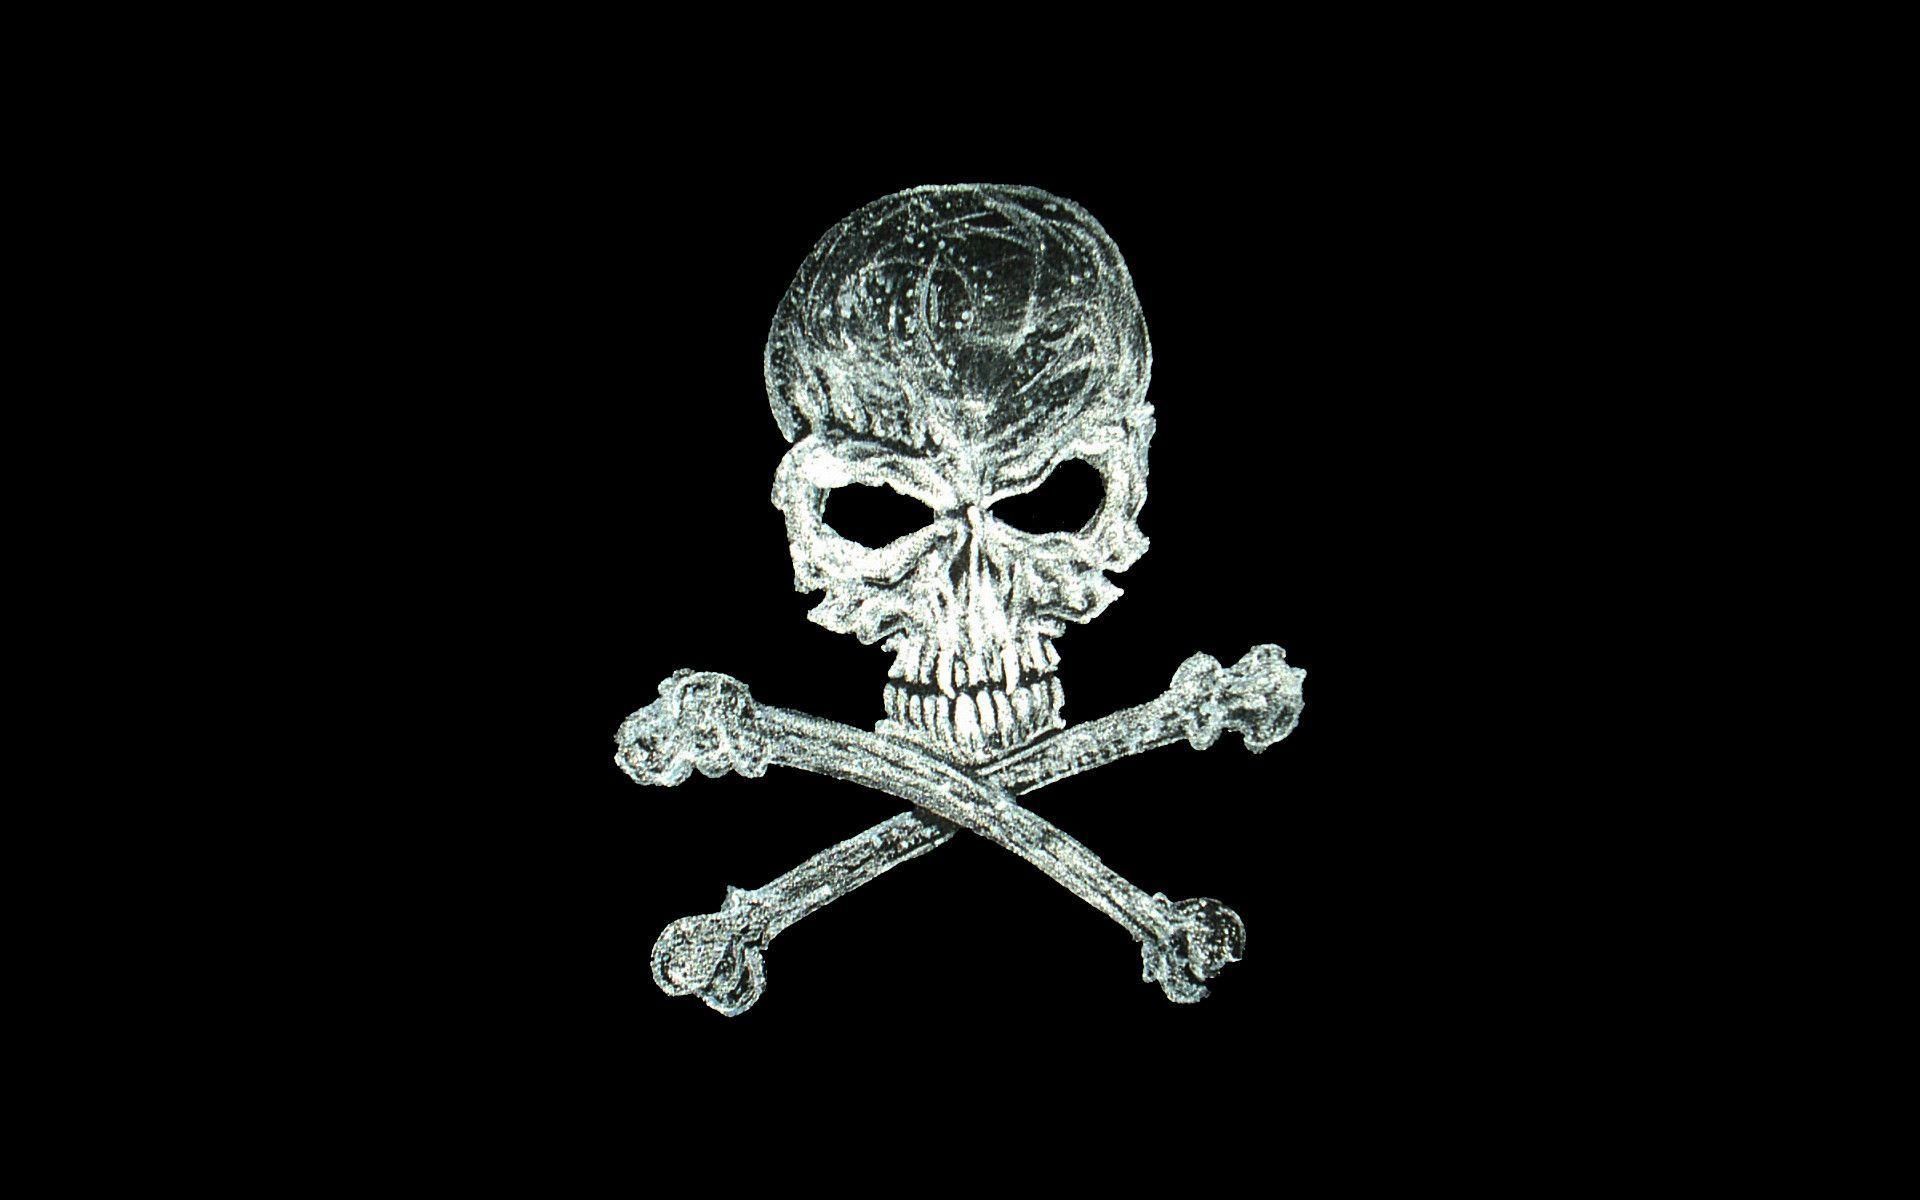 wallpaper skull bones pirate - photo #4